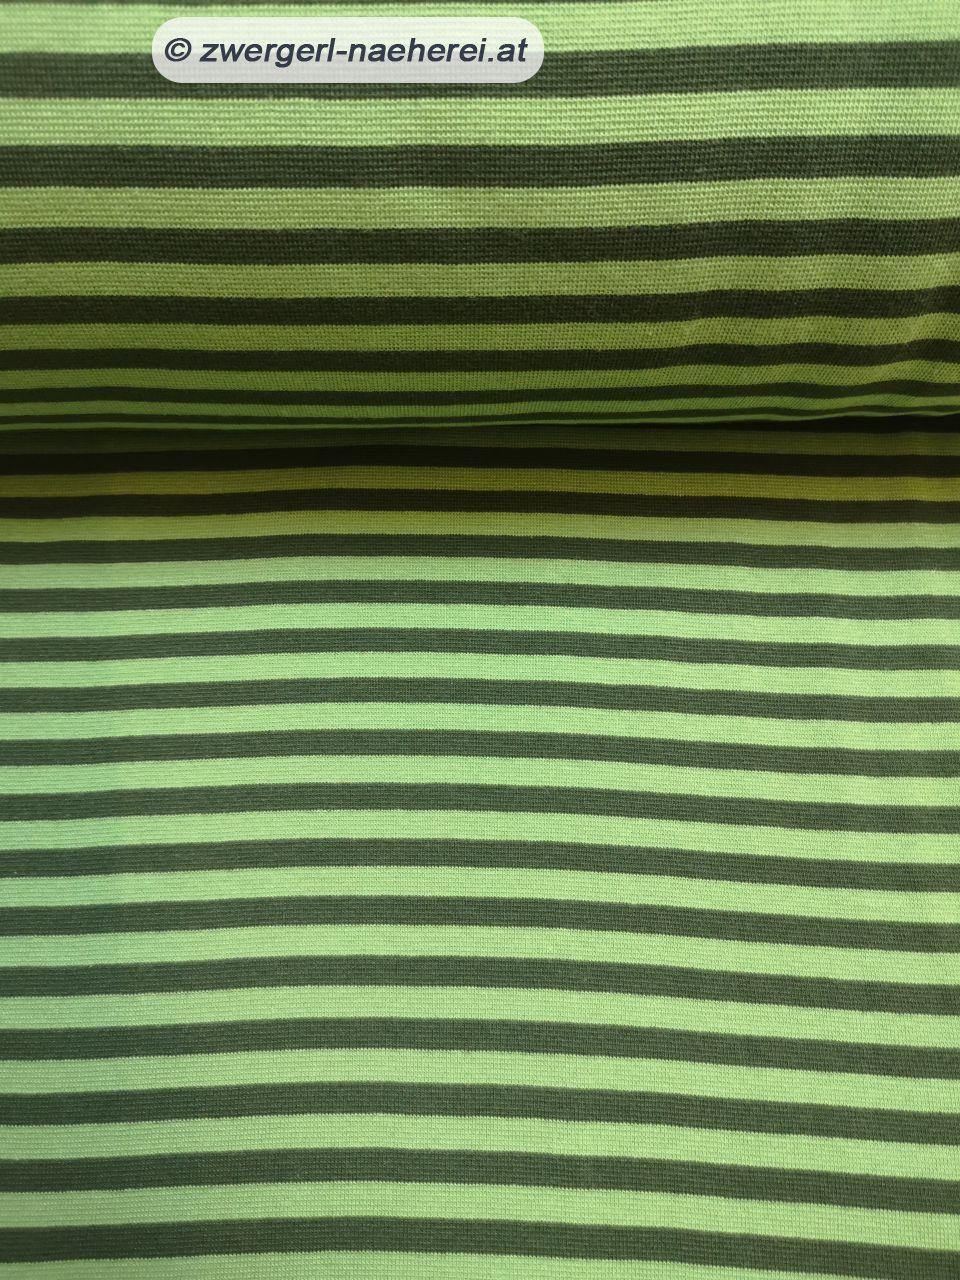 Stoff-Baumwolle-Jersey-Bündchen-Fleece_004